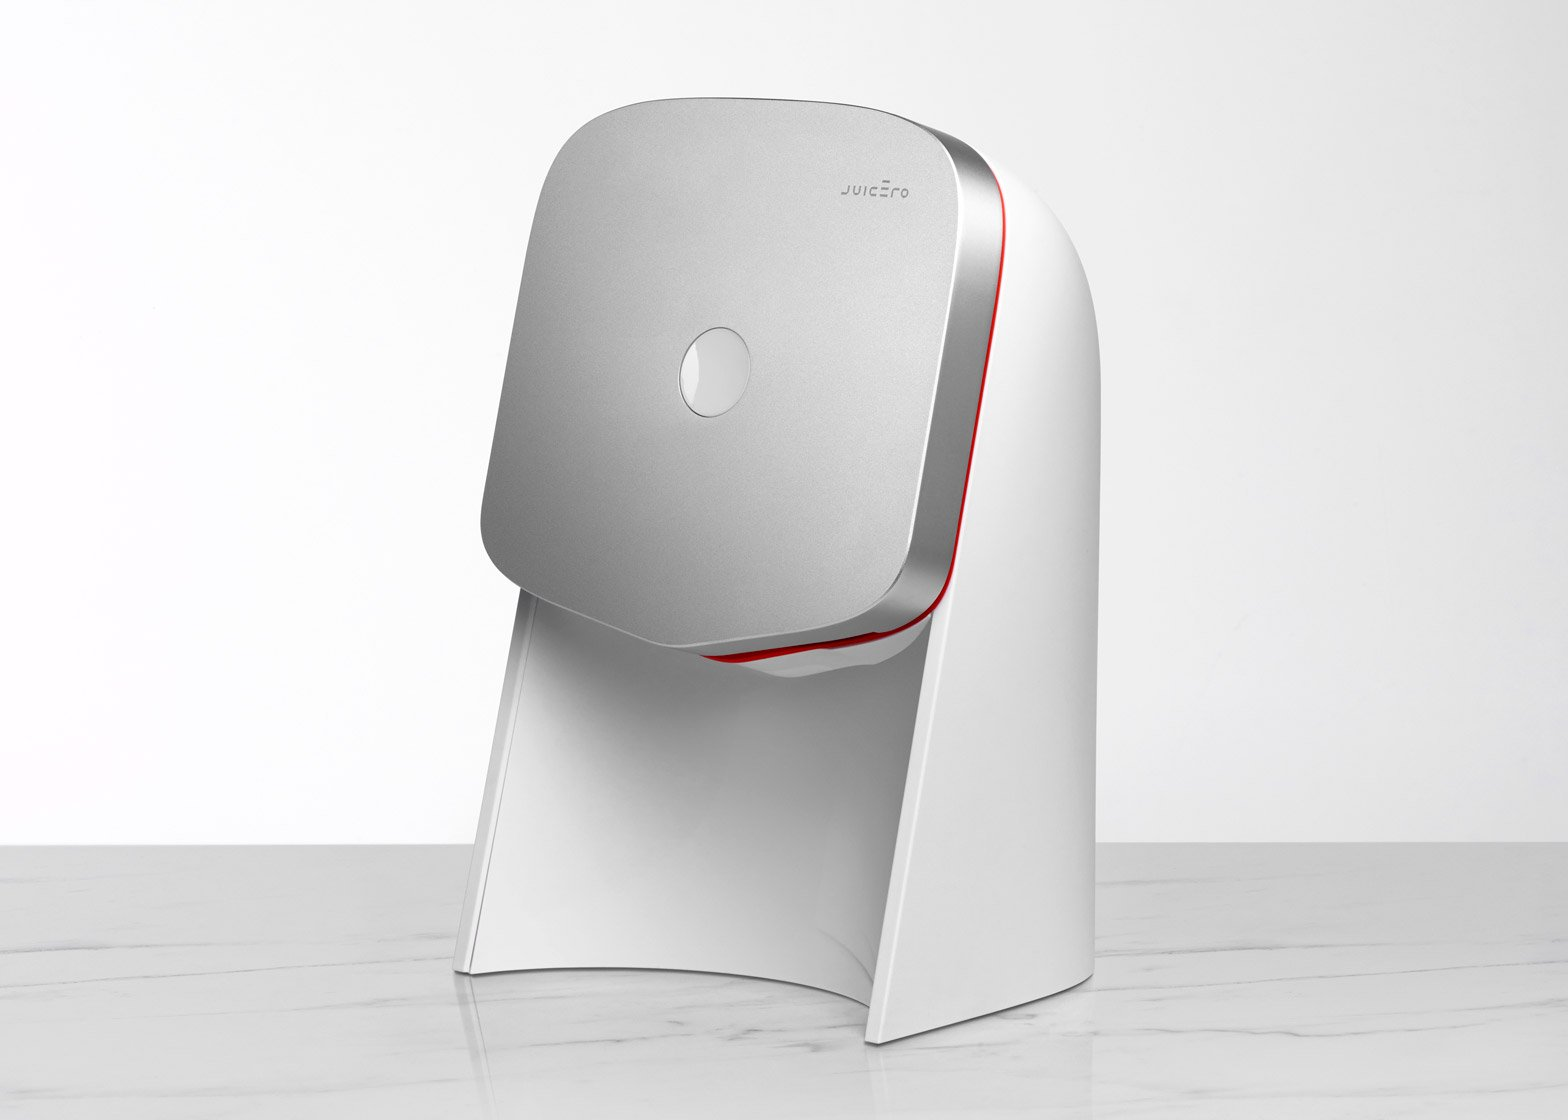 Juicero by Yves Behar